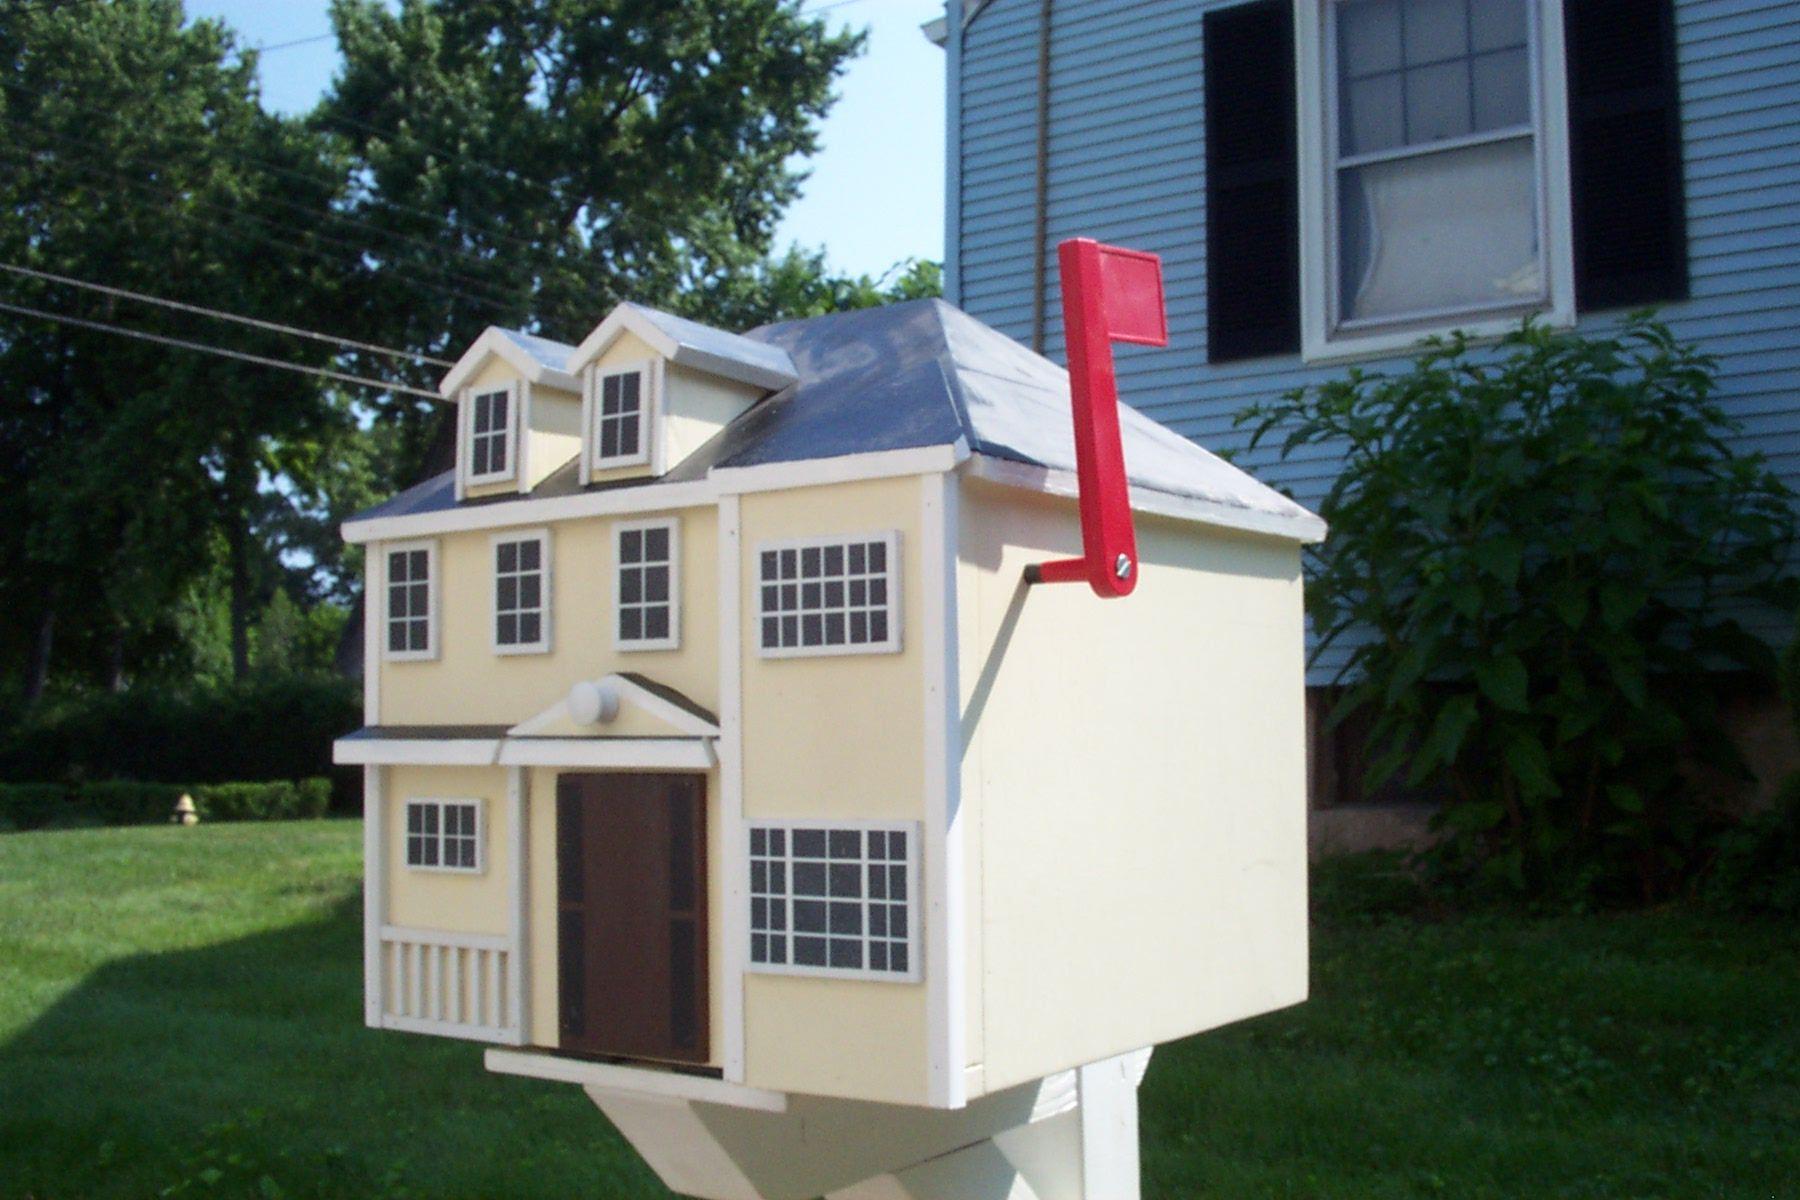 Mailbox That Enhances The Home